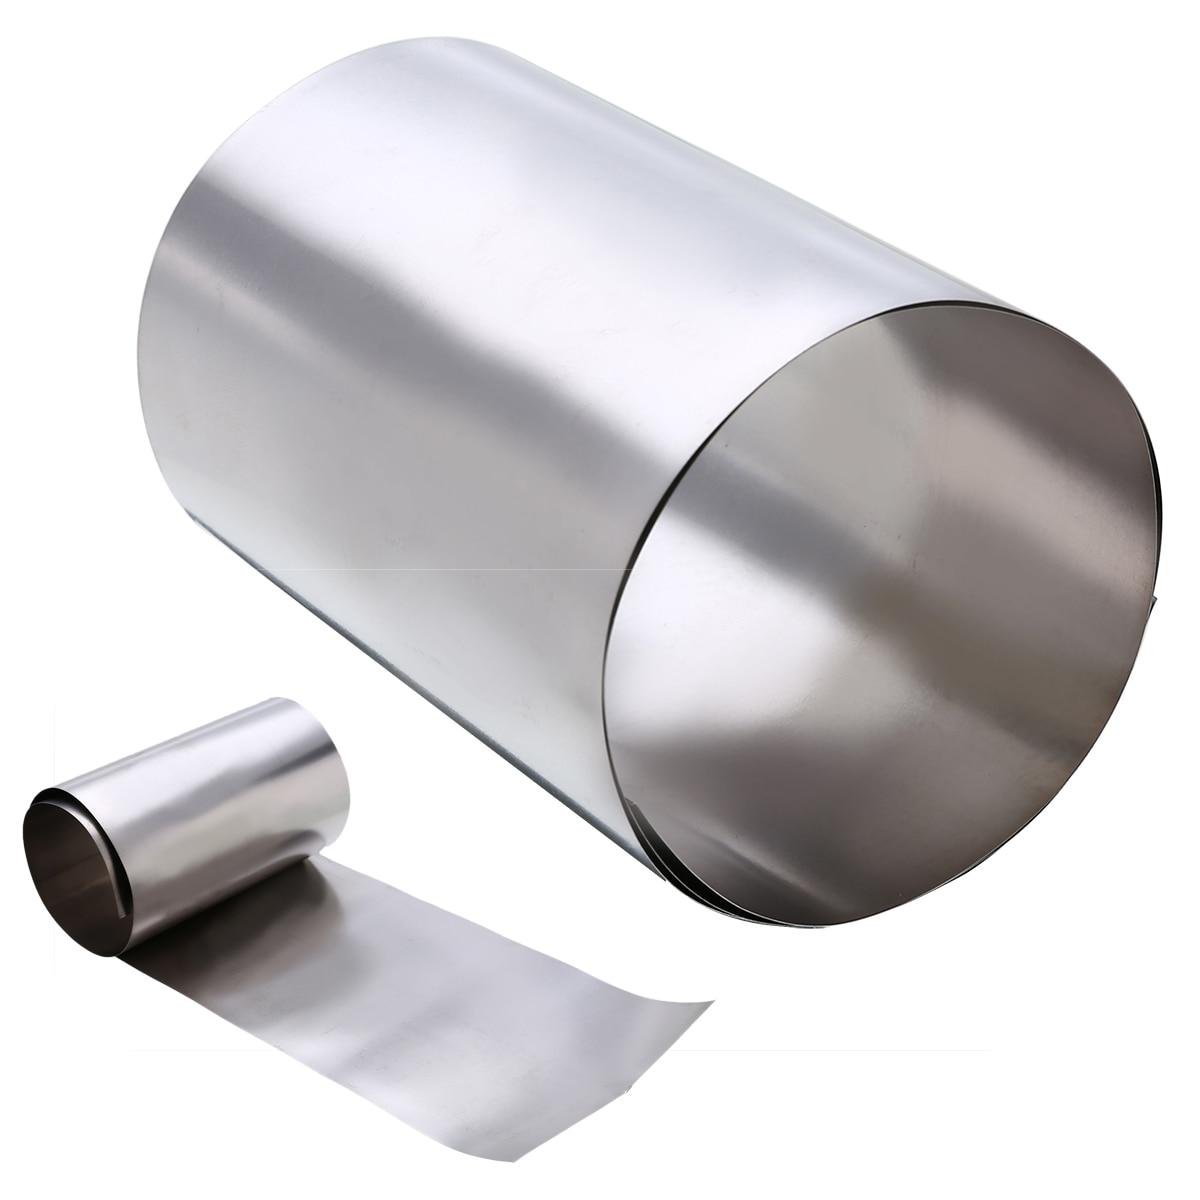 1pc Gr2 Titanium Foil Silver Thin Ti Sheet High Purity Metal Square Plate Sheet Foil Craft 0.1x100x500mm Mayitr